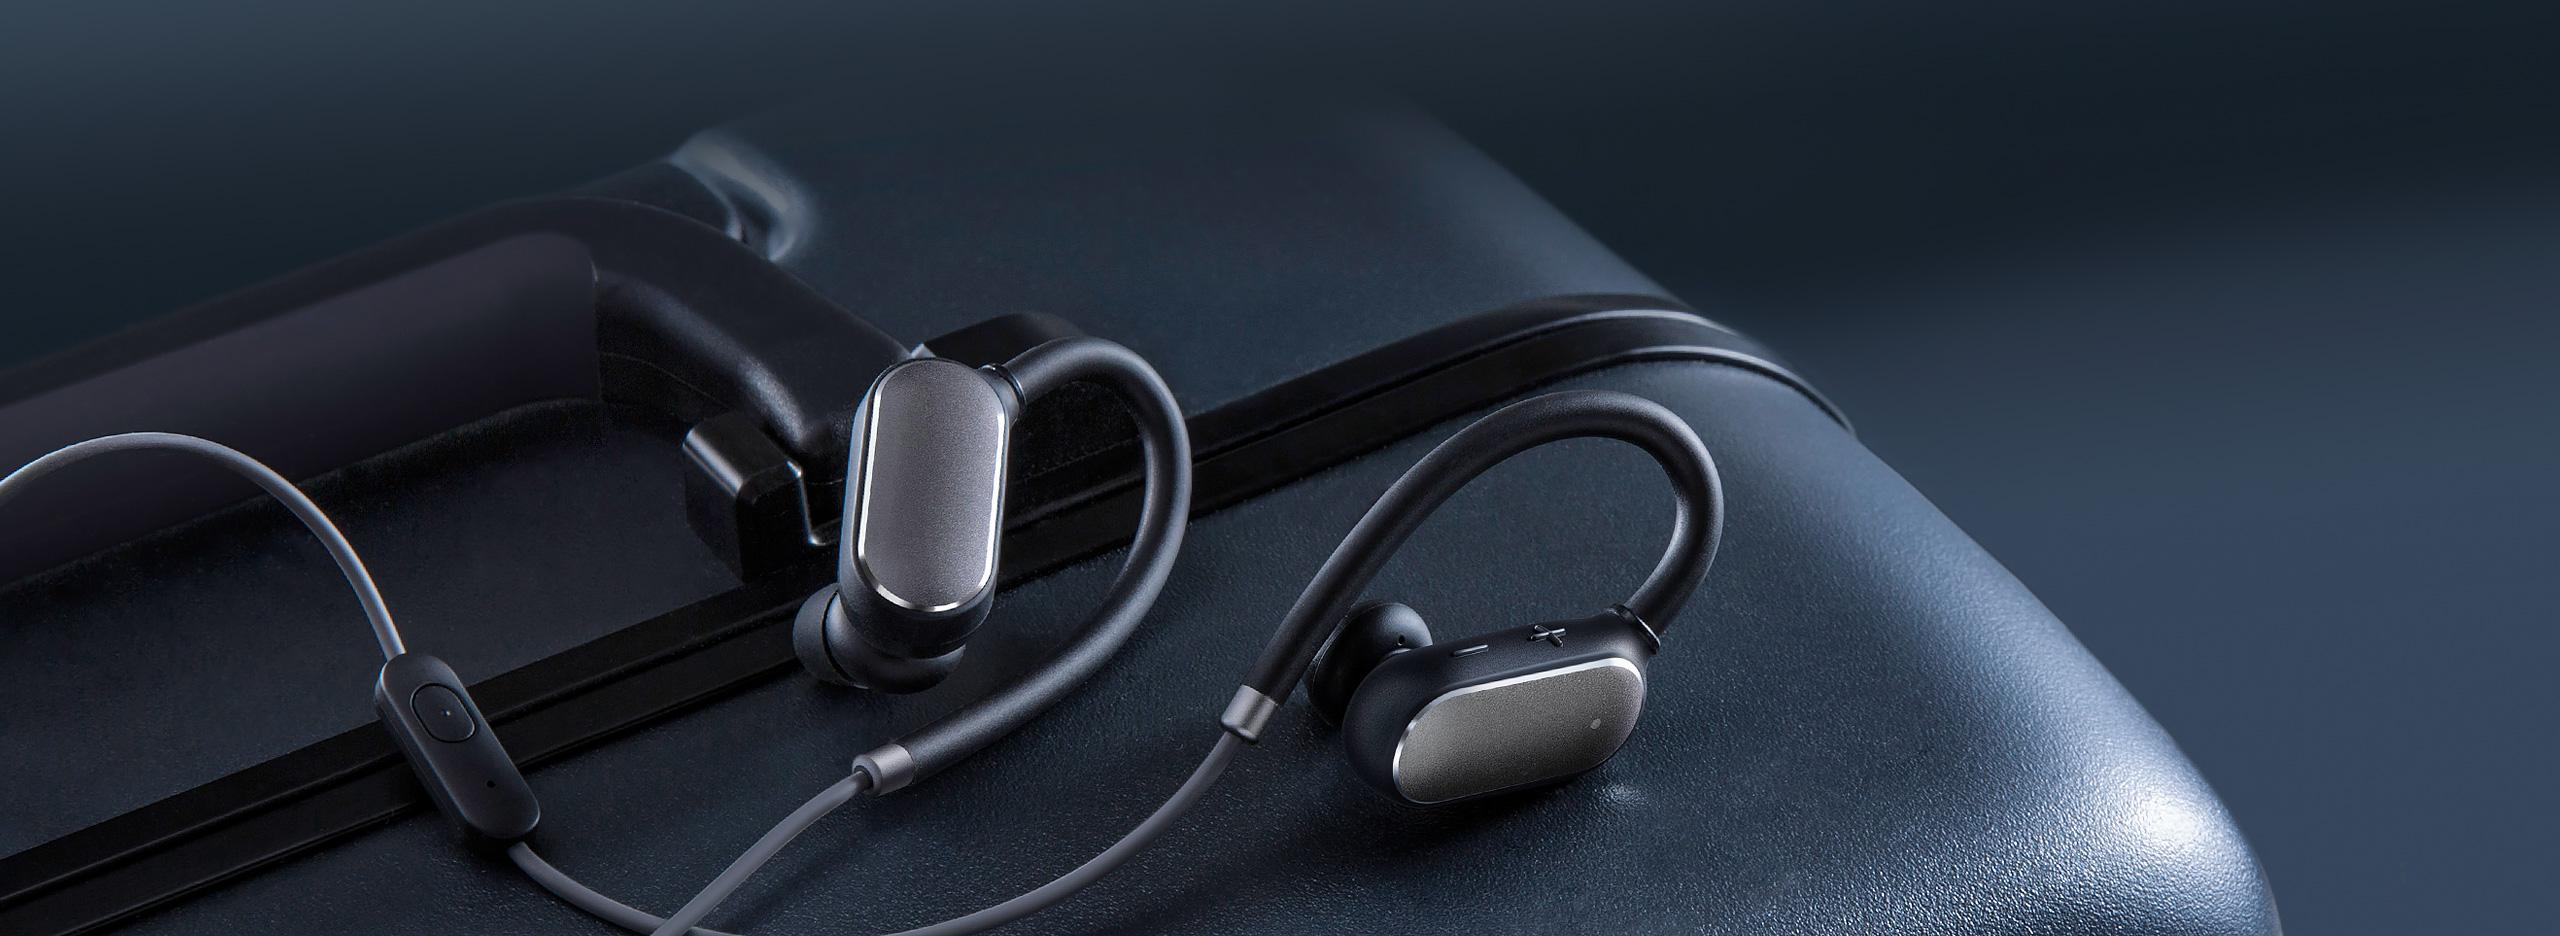 bt-stereo-headset03